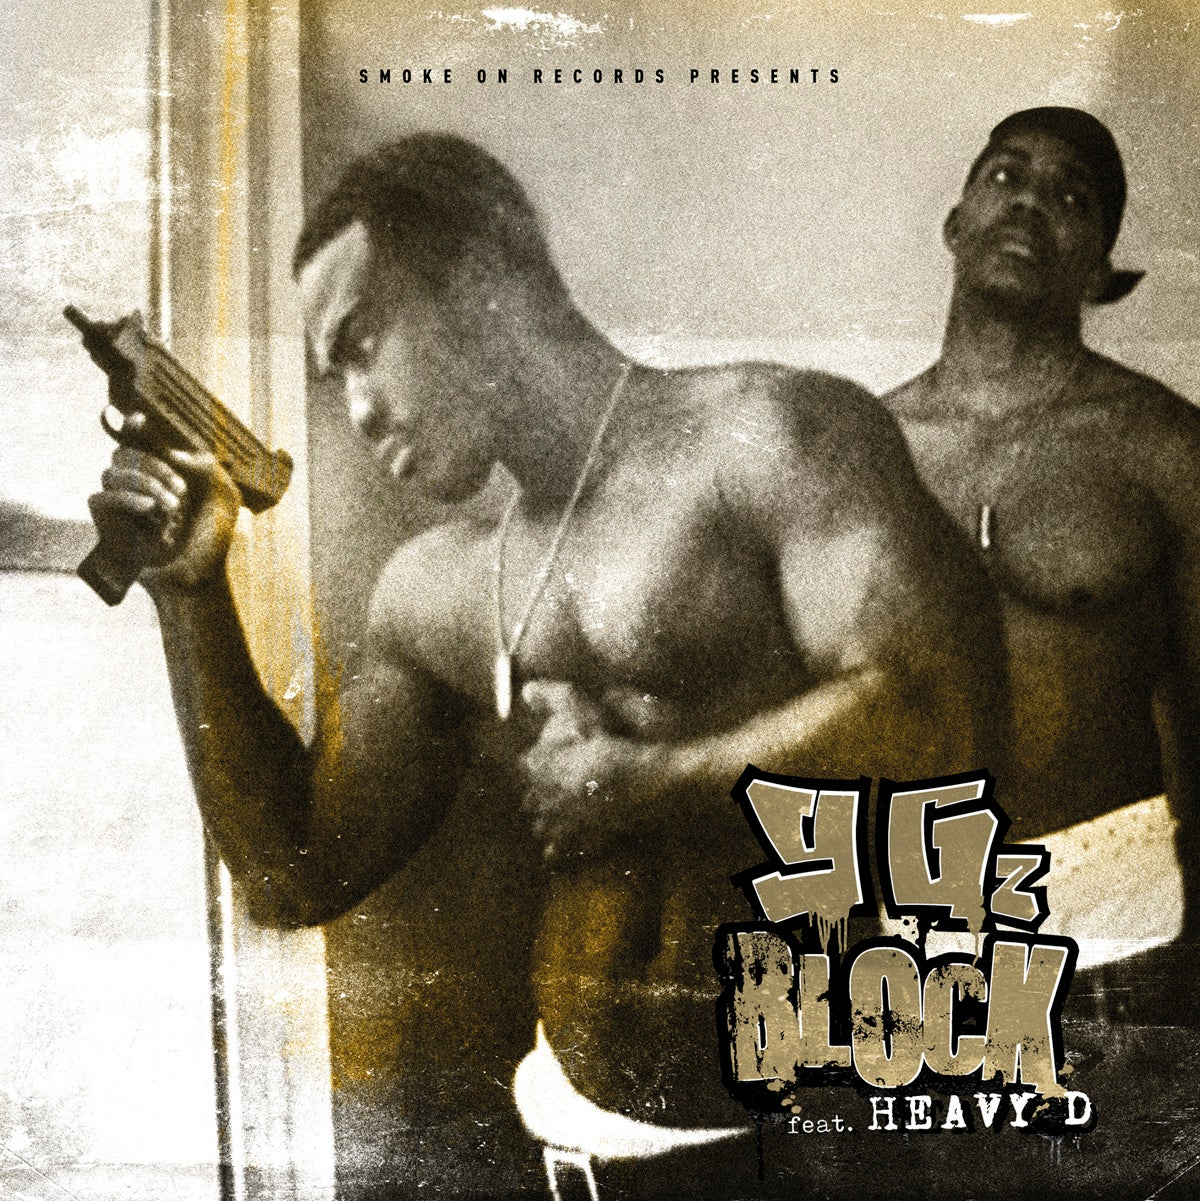 Image of YG'z - Block CD